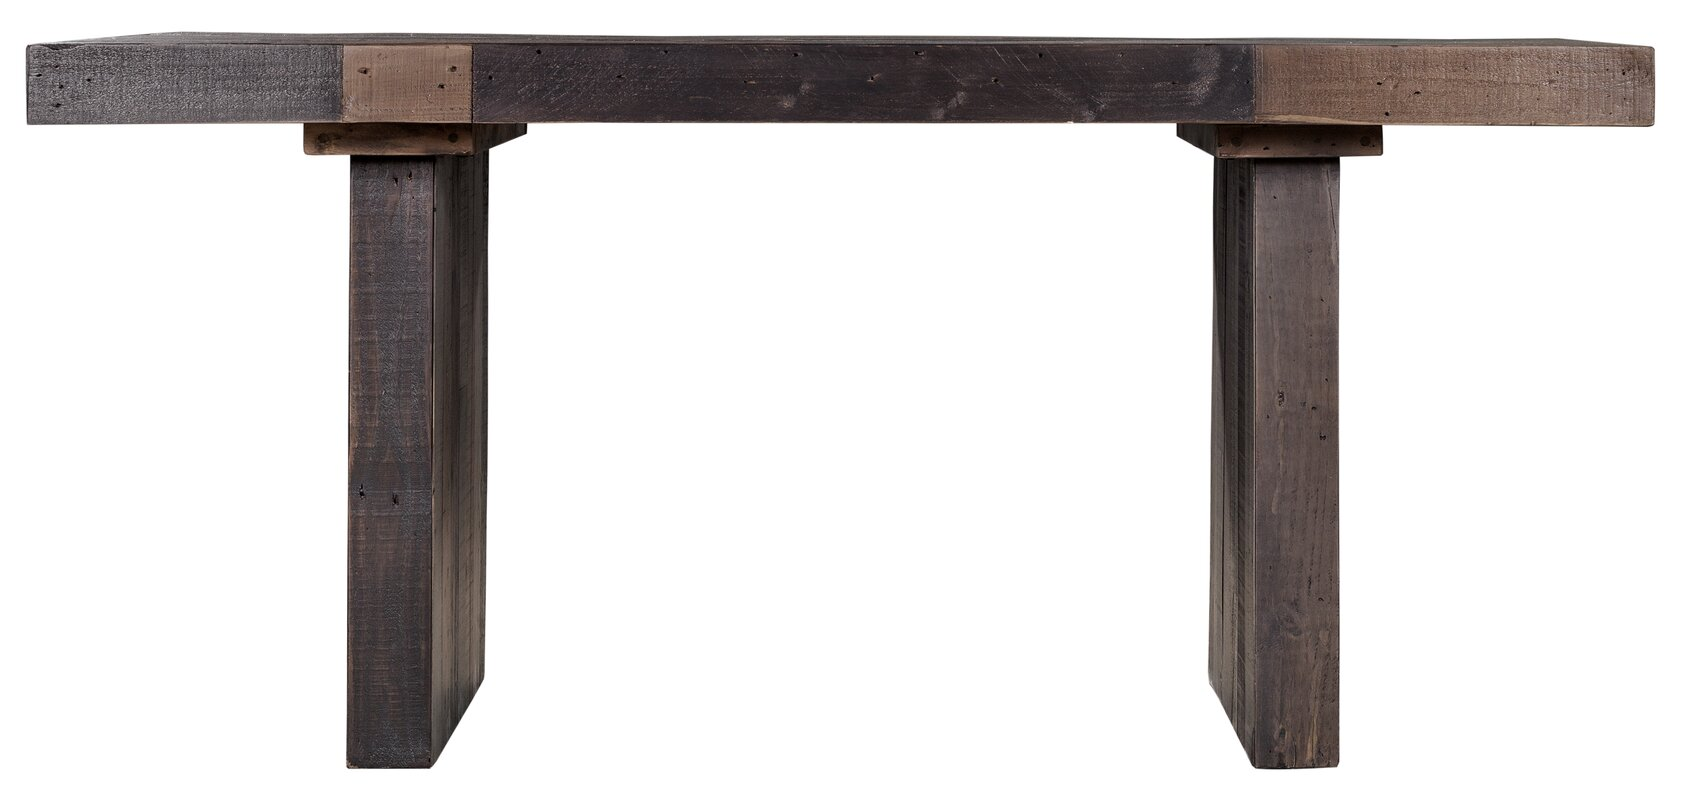 Trent austin design antigo dining table reviews wayfair antigo dining table watchthetrailerfo